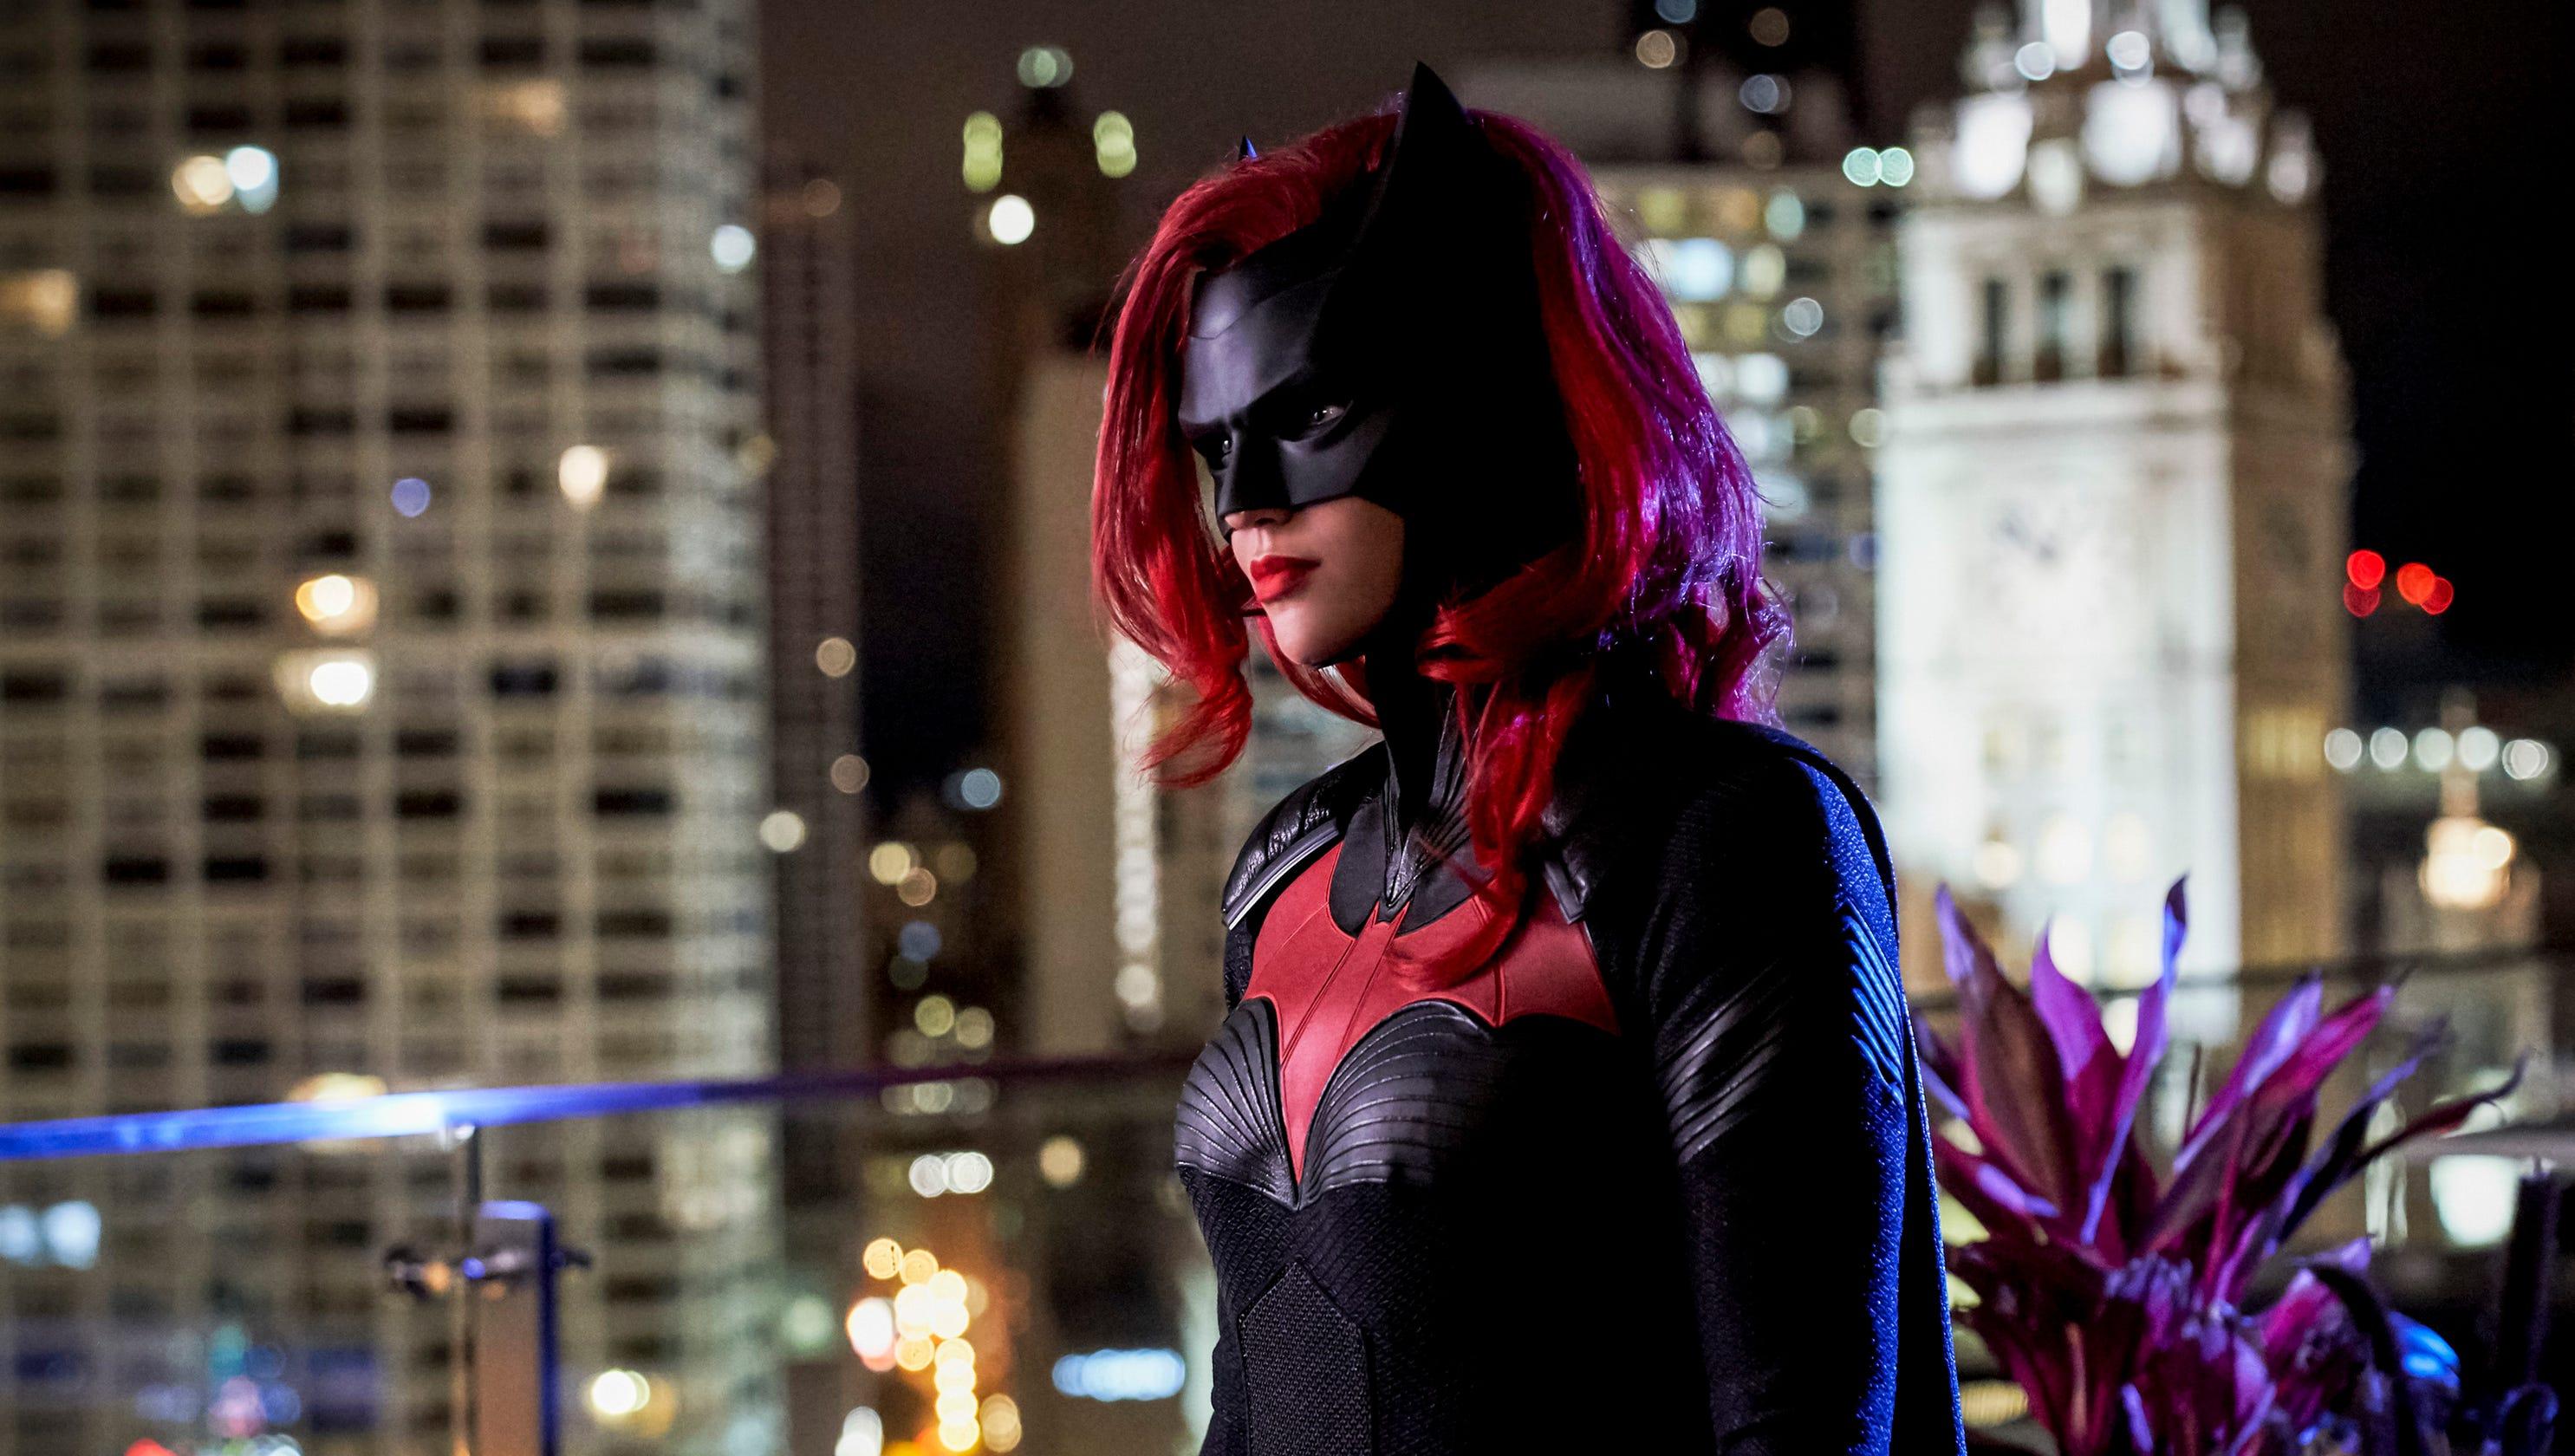 Batwoman, body swaps star in CW's 'Elseworlds' superhero